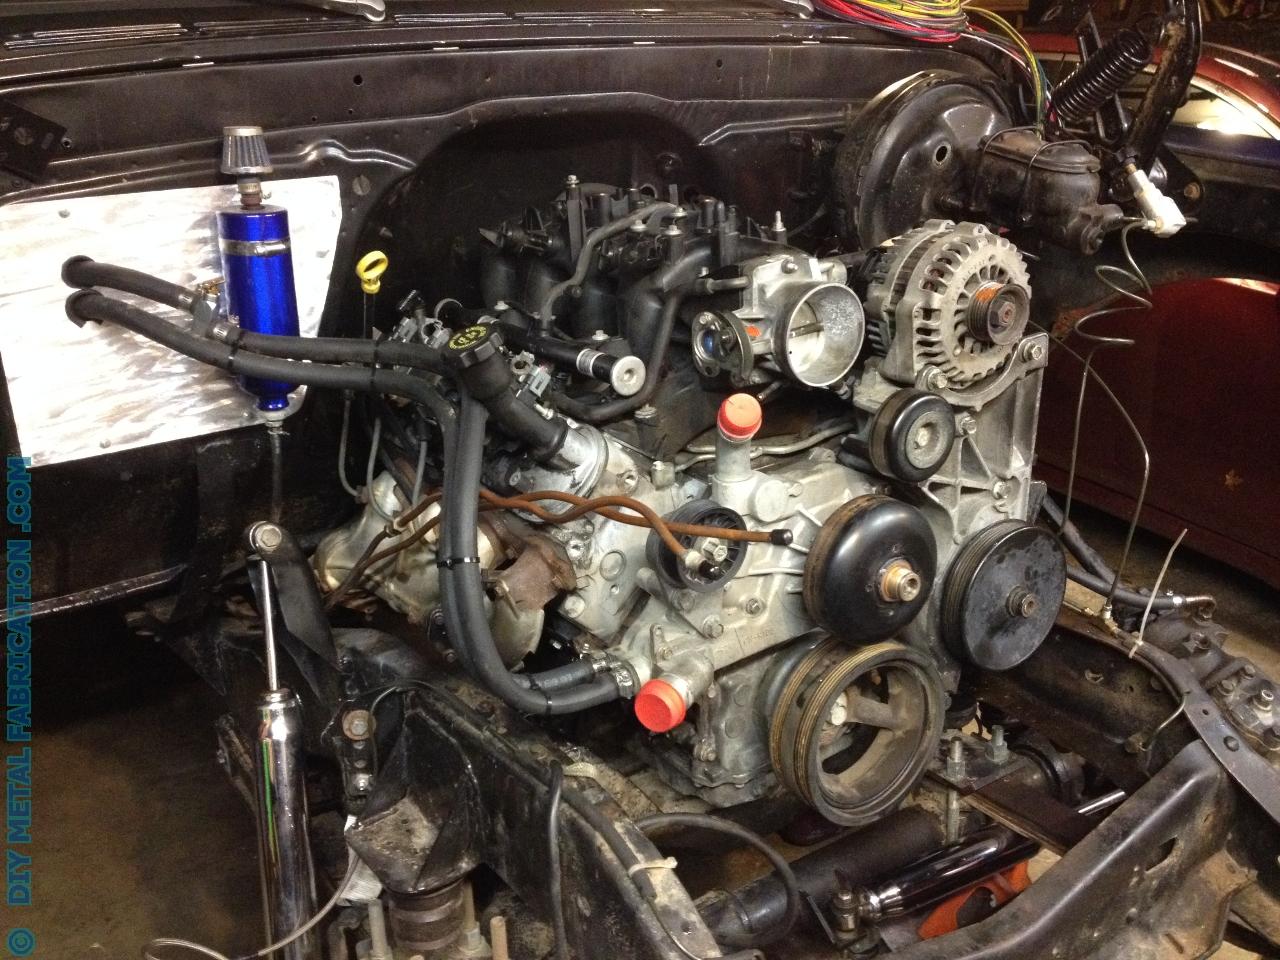 Suzuki Linkage Rebuild Tools